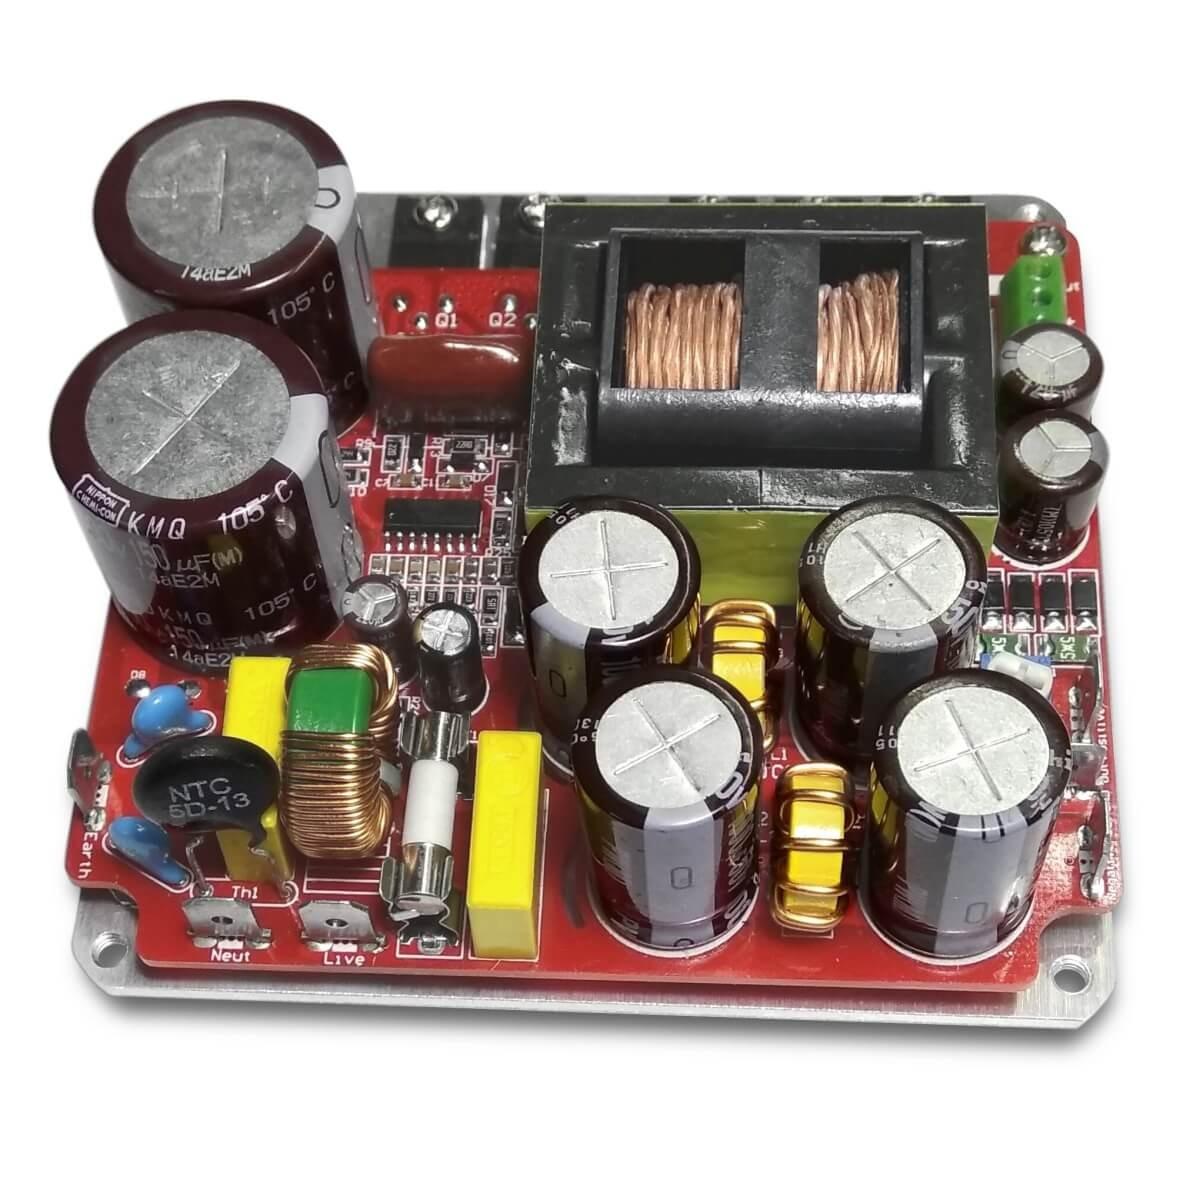 CONNEX SMPS300RAh Power supply Module 300W +/-30V